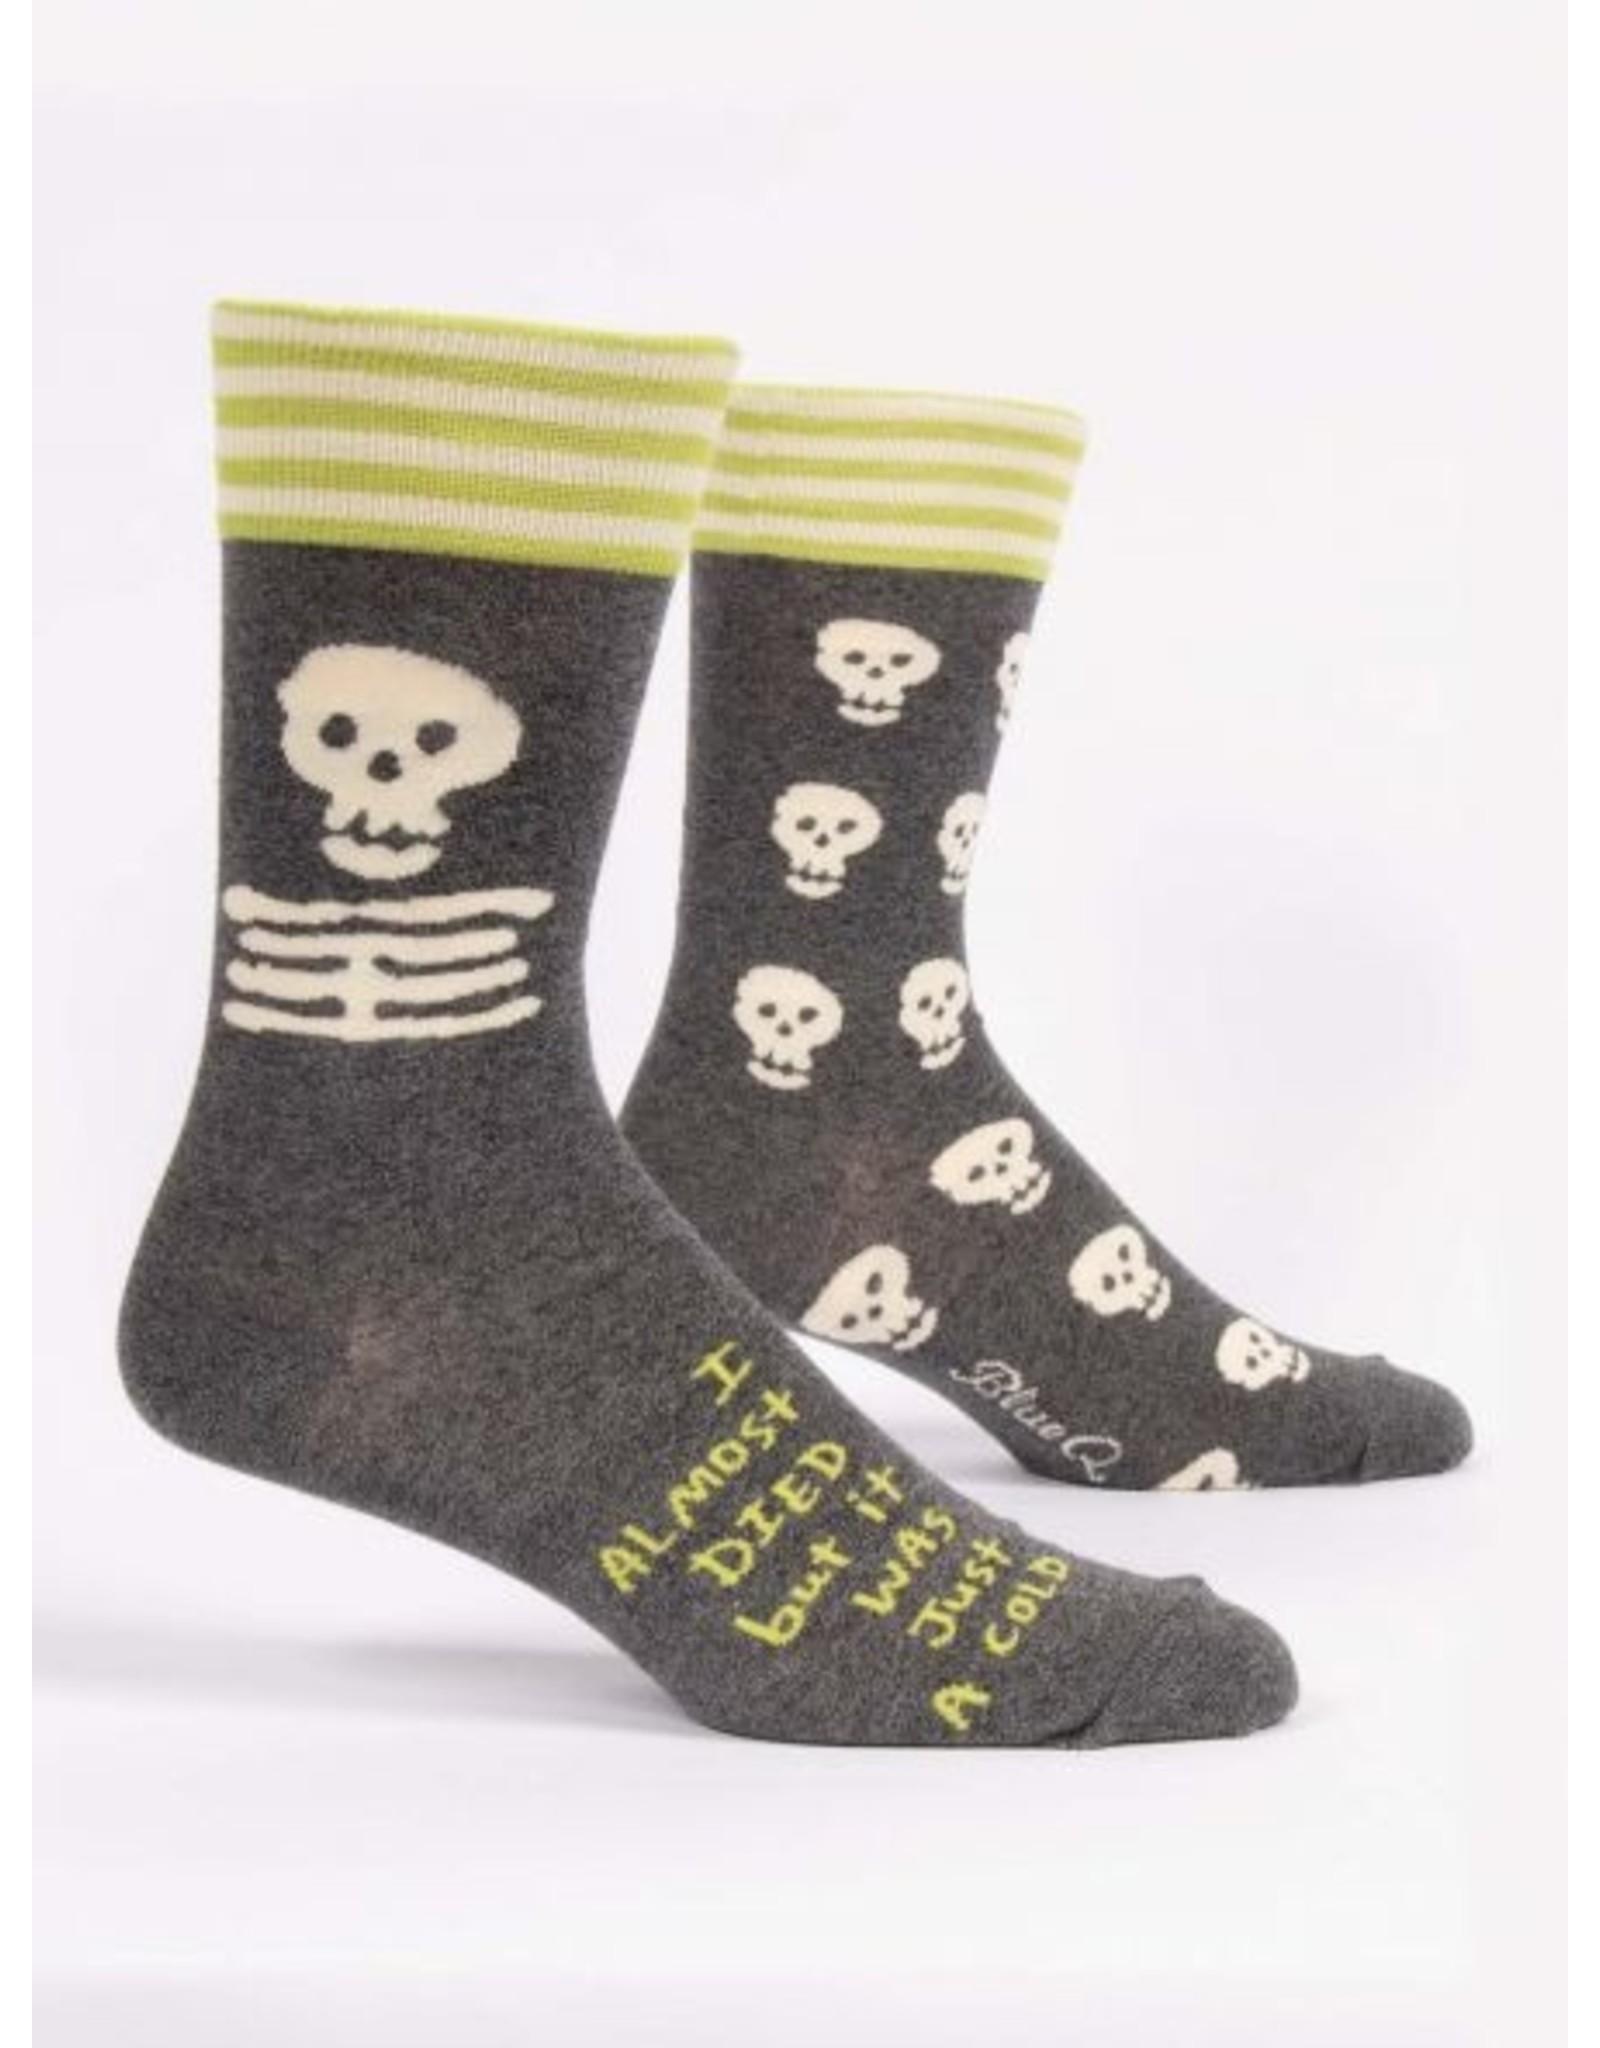 BQ Mens Sassy Socks - Almost Died